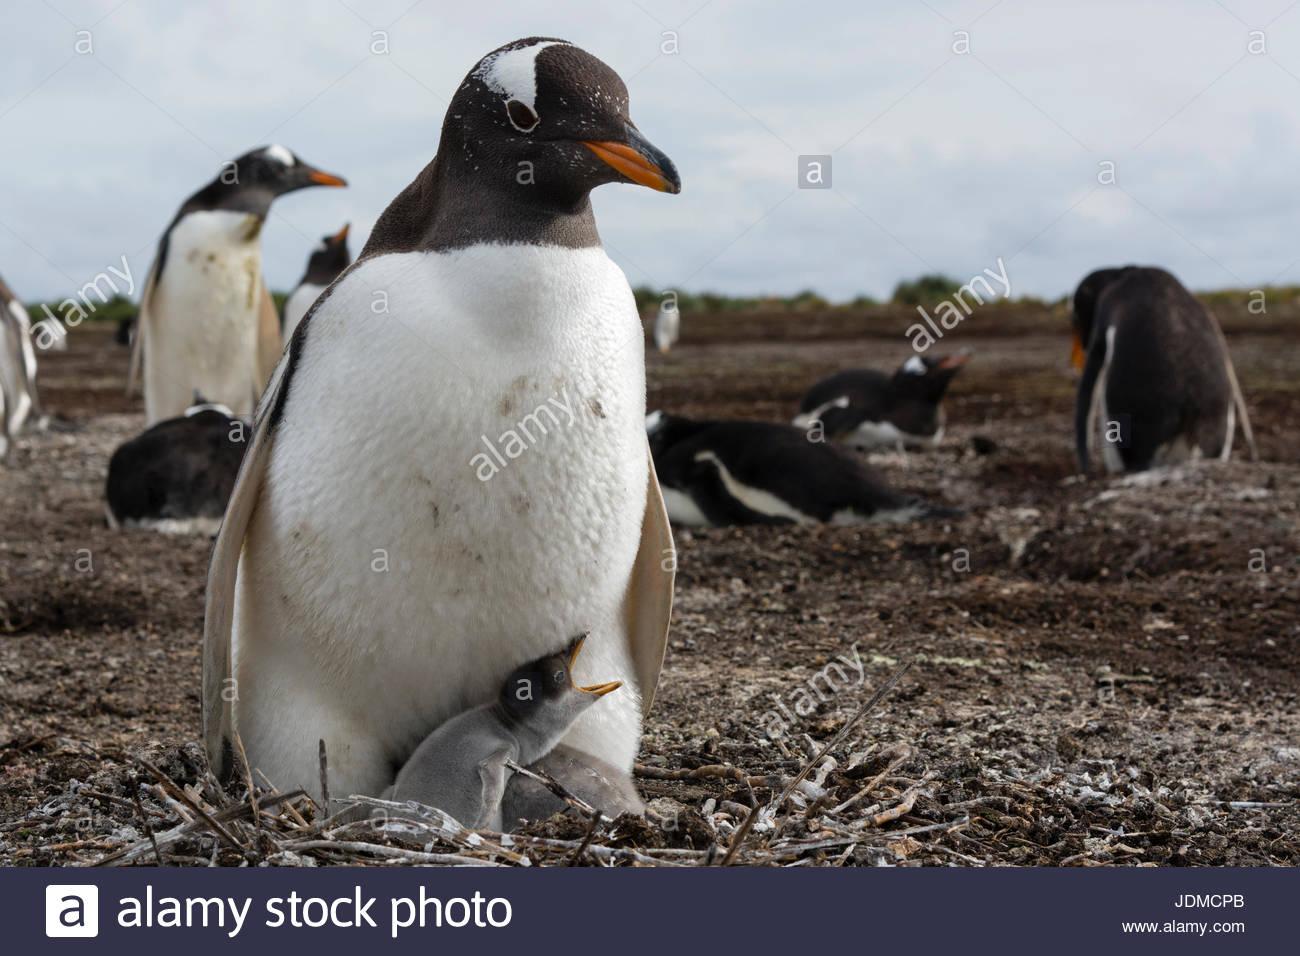 A Gentoo penguin, Pygoscelis papua, with its chick. - Stock Image